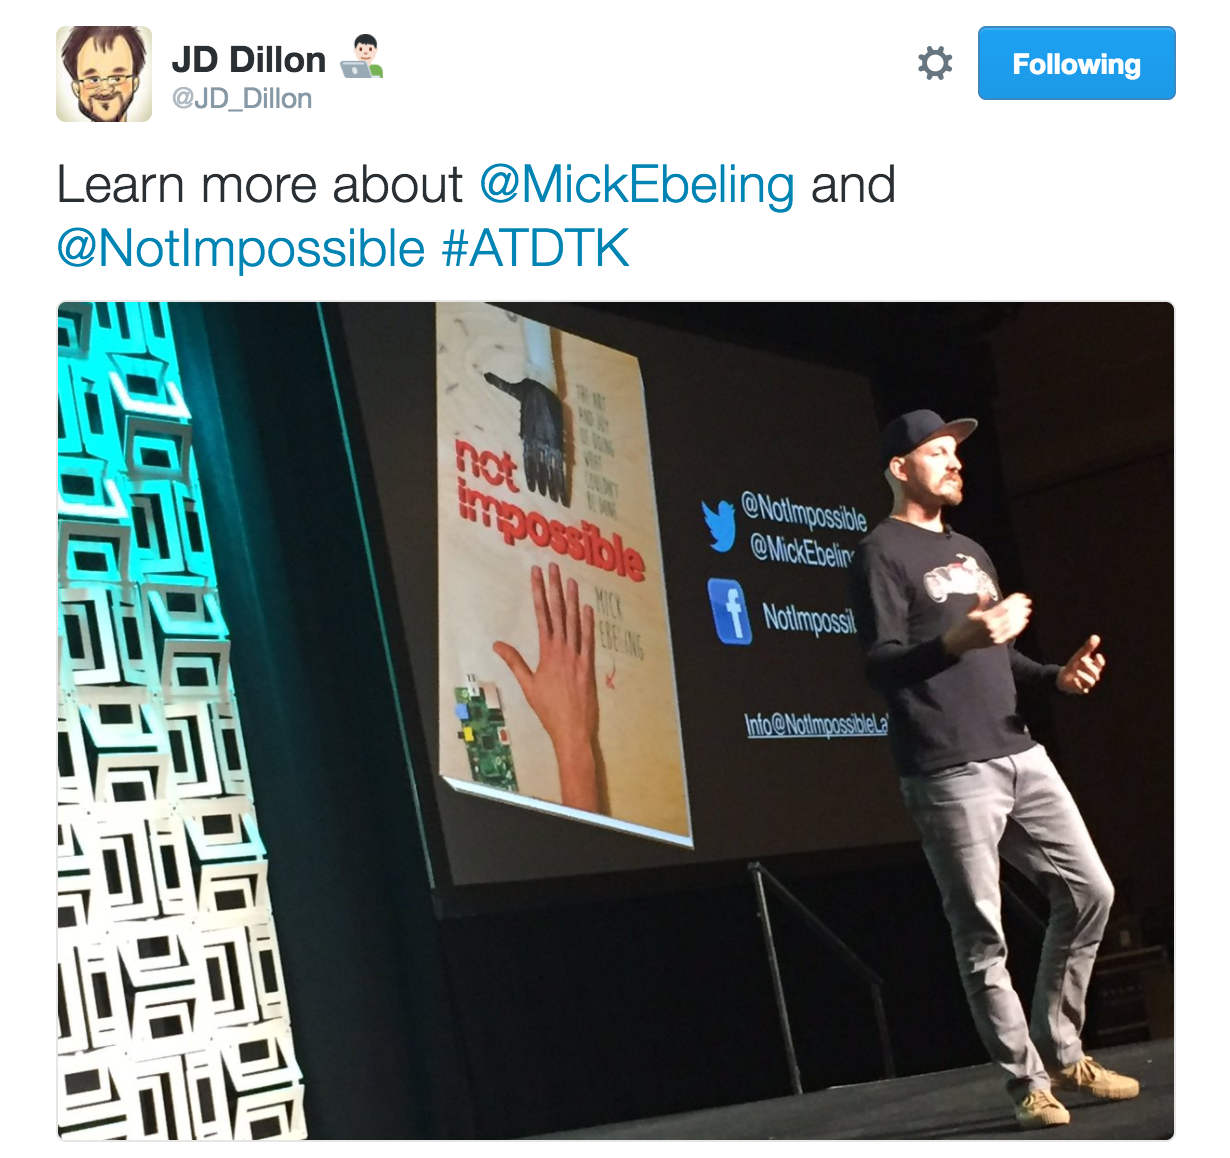 ATD TechKnowledge 2017 Mick Ebeling Tweet